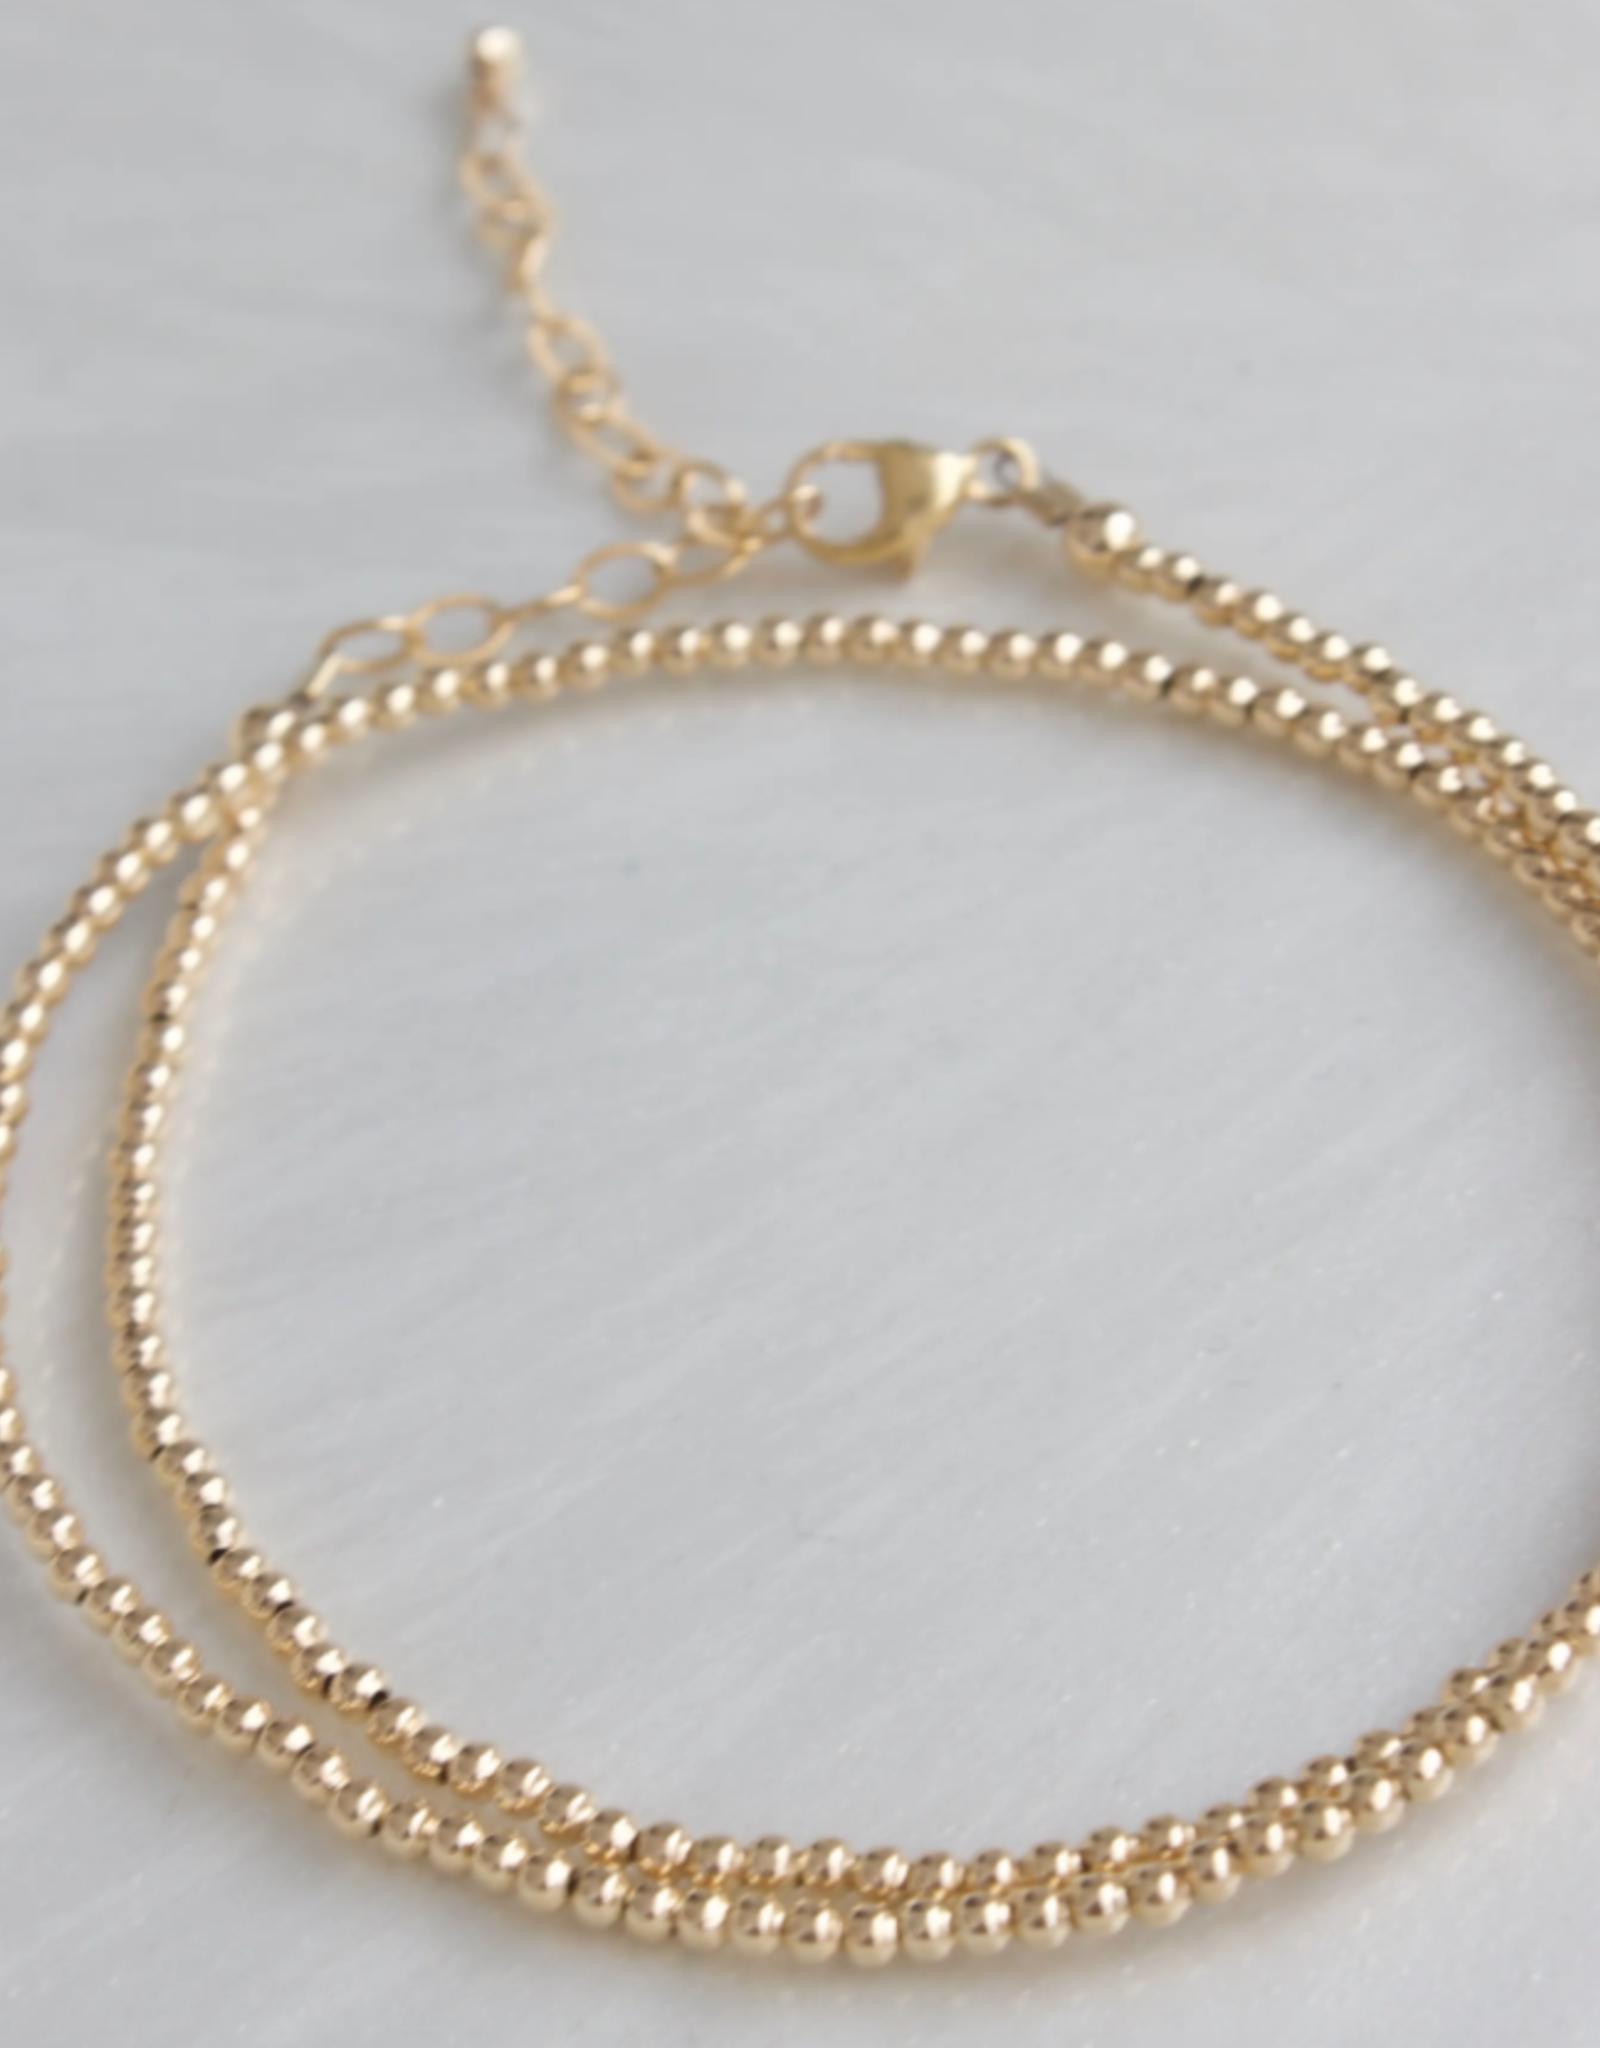 Gold Filled Double Wrap Bead Bracelet 2mm